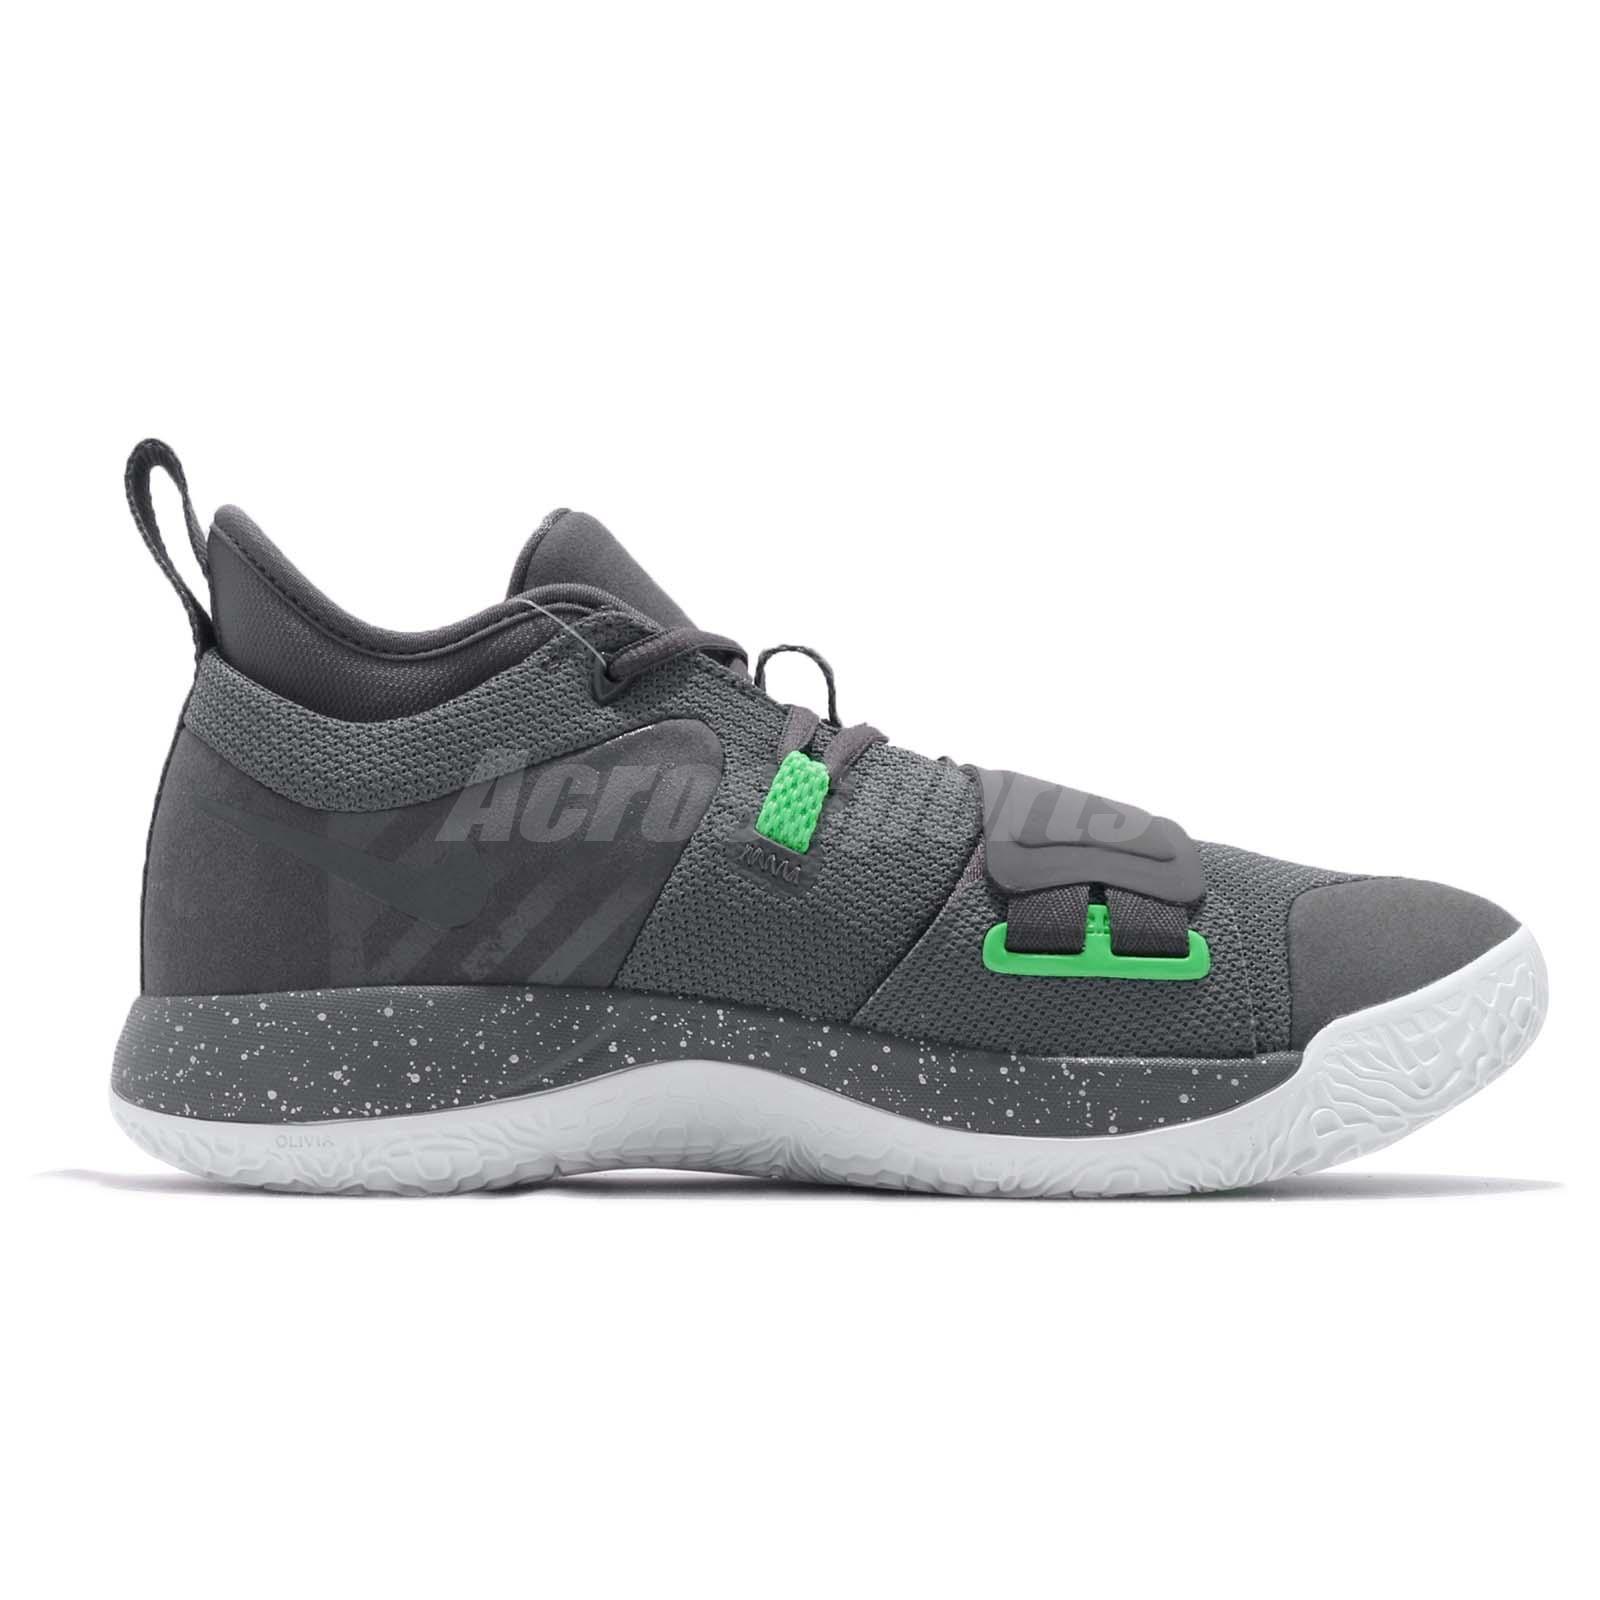 Nike PG 2.5 EP Paul George Grey Green White Men Basketball Shoes ... 1324b8b5e